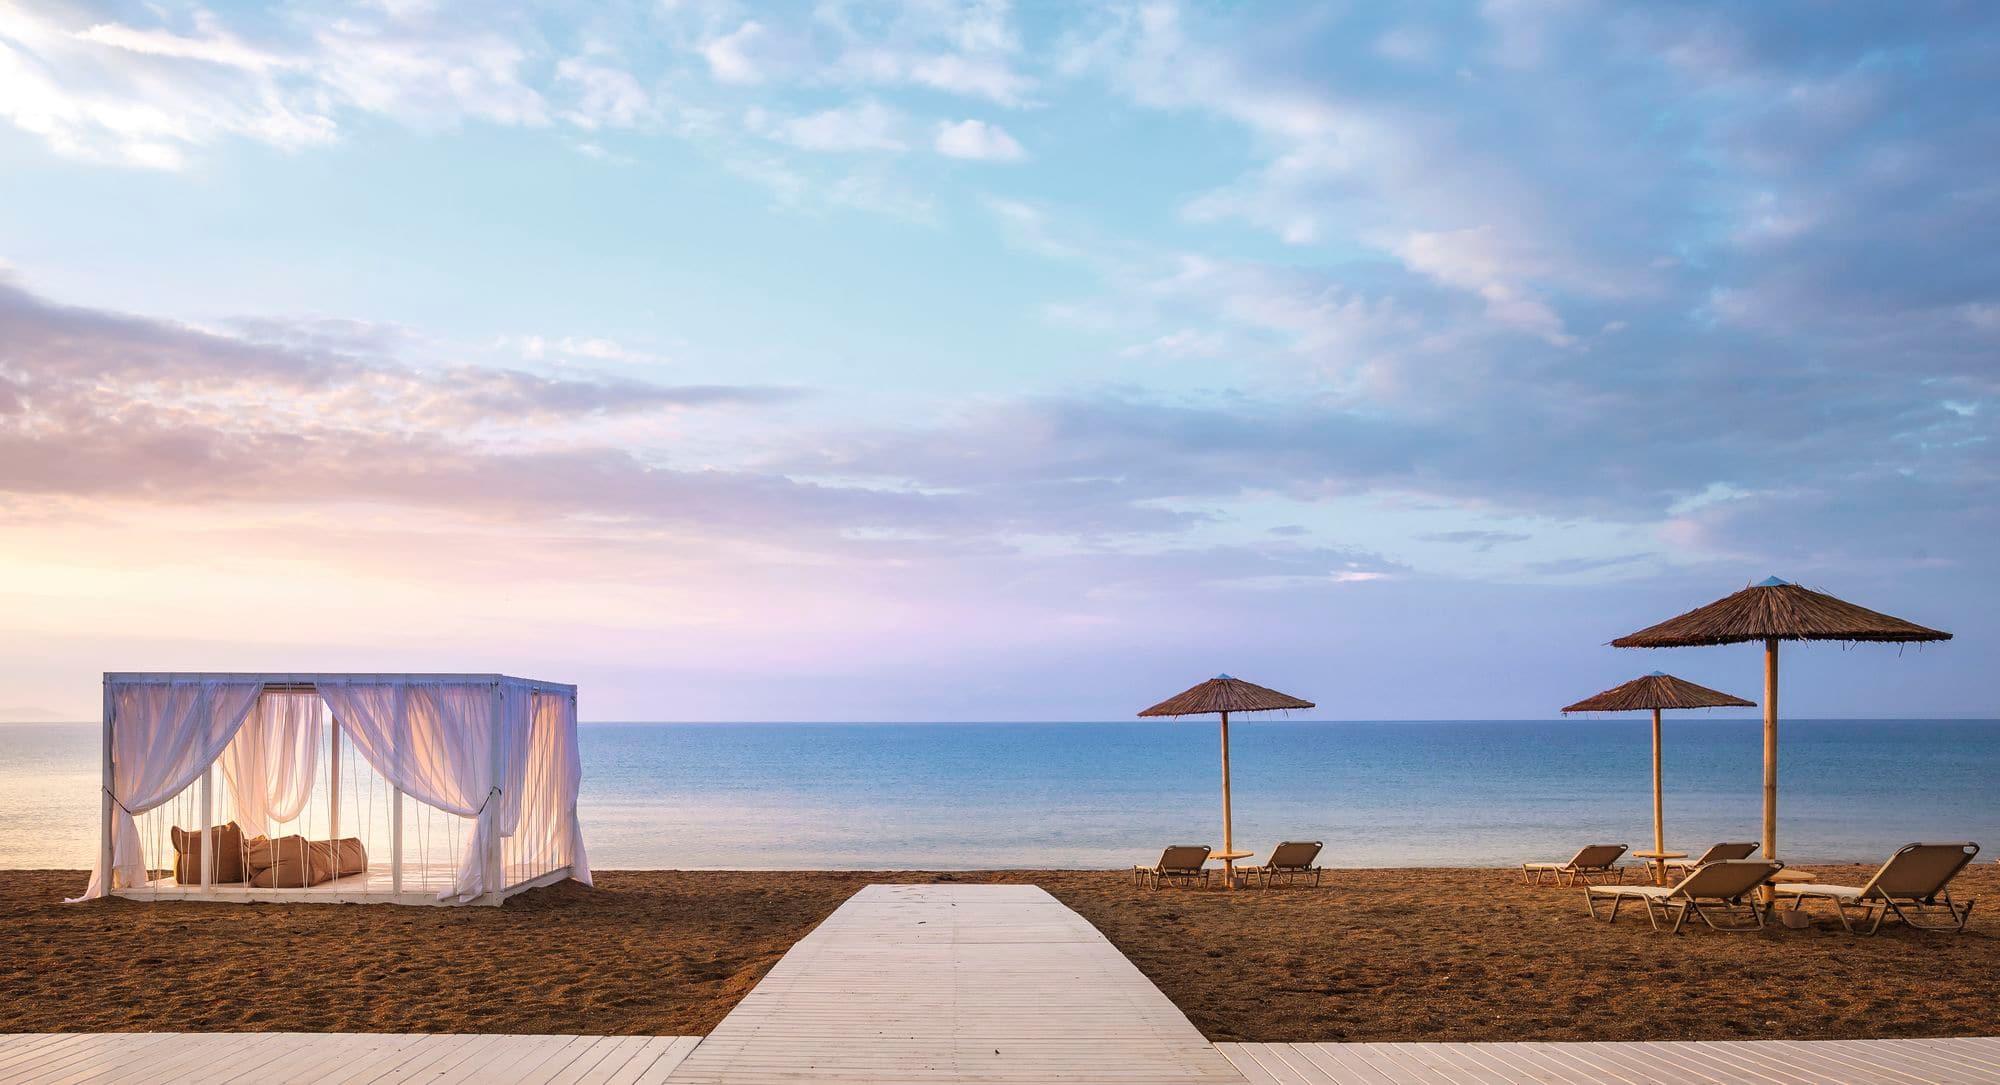 Greece sandy beach